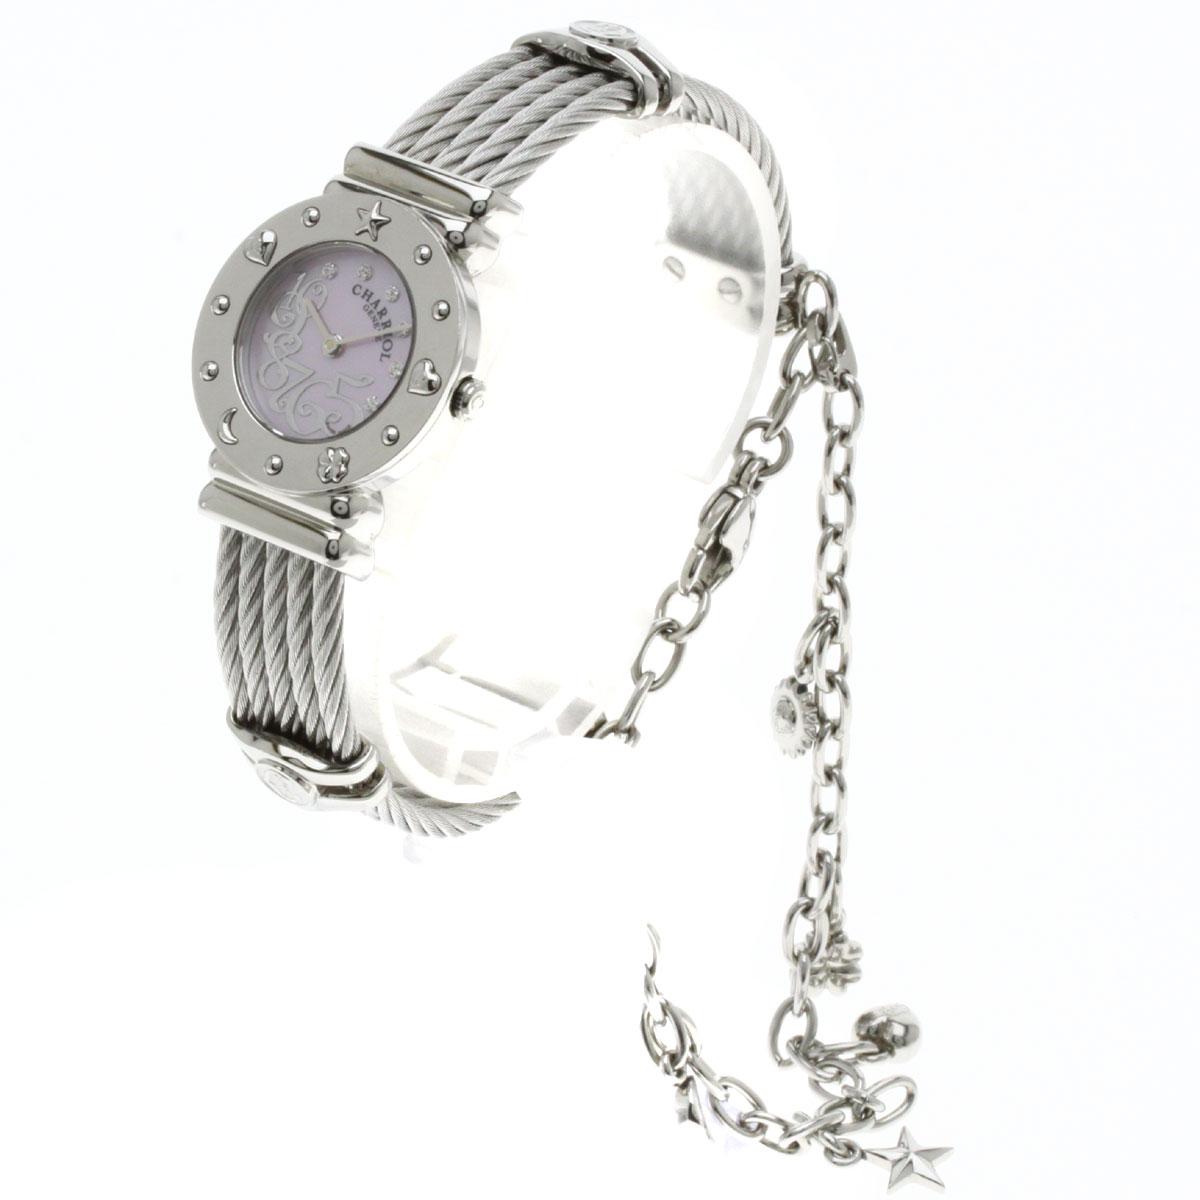 PHILIPPE CHARRIOL REF.028/2手表不锈钢女士